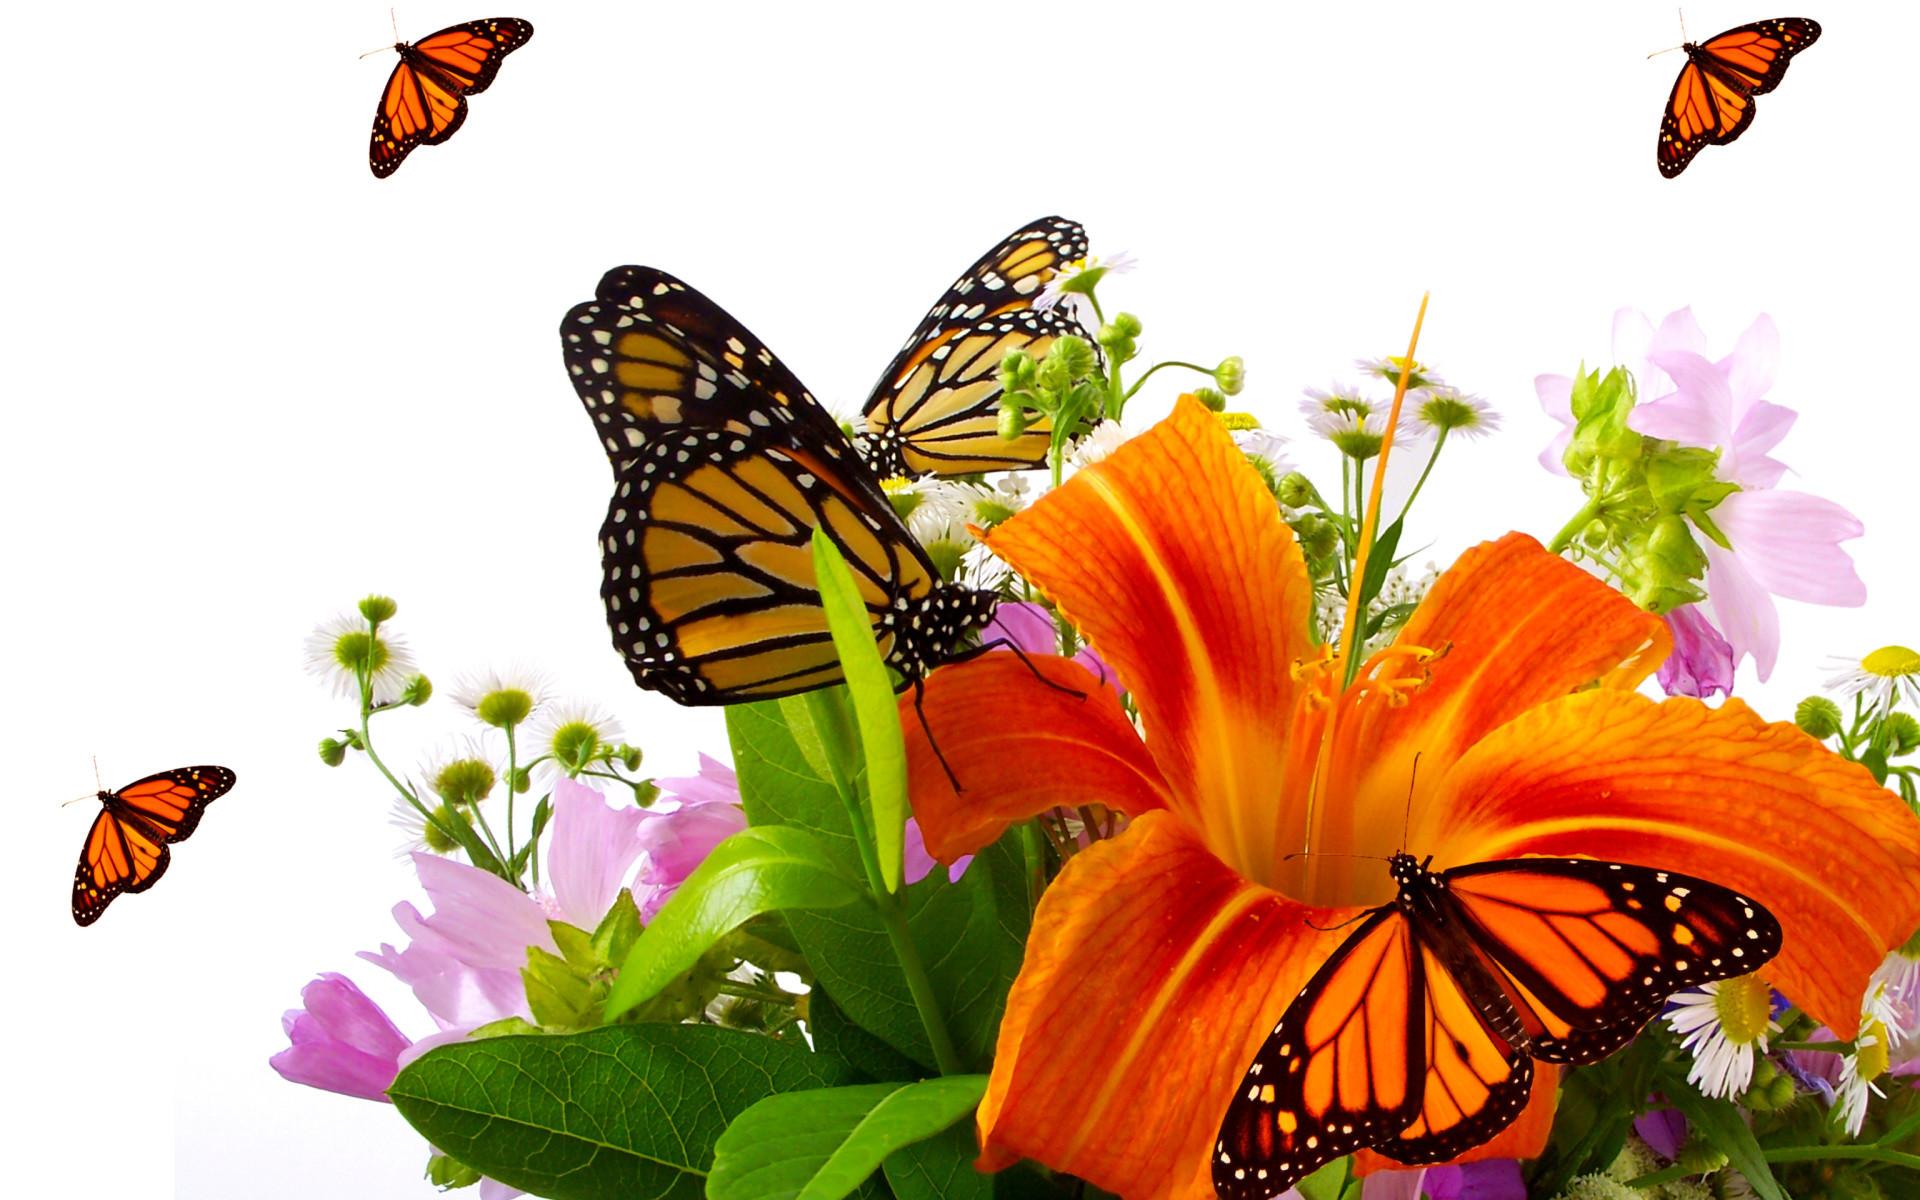 Butterfly 3d Live Wallpaper Free Download Descargar Wallpaper Para Computadoras Gratis 59 Images